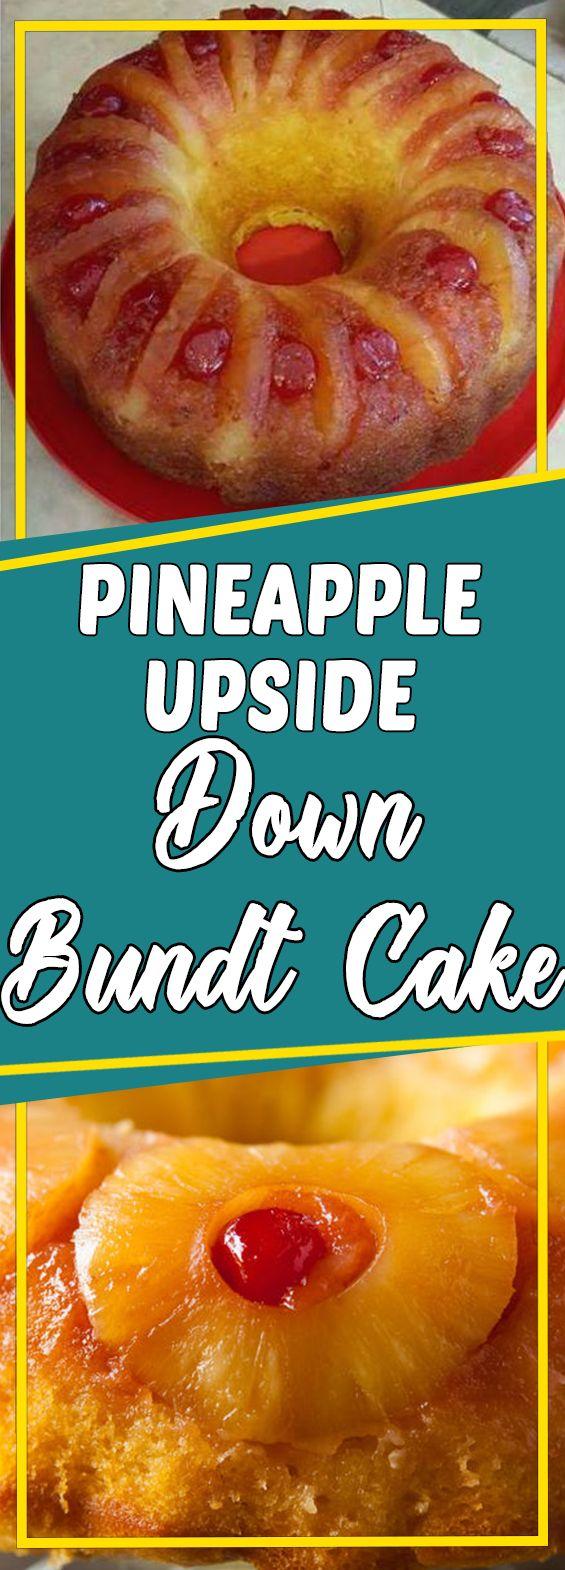 Pineapple Upside Down Bundt Cake #dessertrecipes #recipeoftheday #recipeideas #dessert #desserttable #appetizer